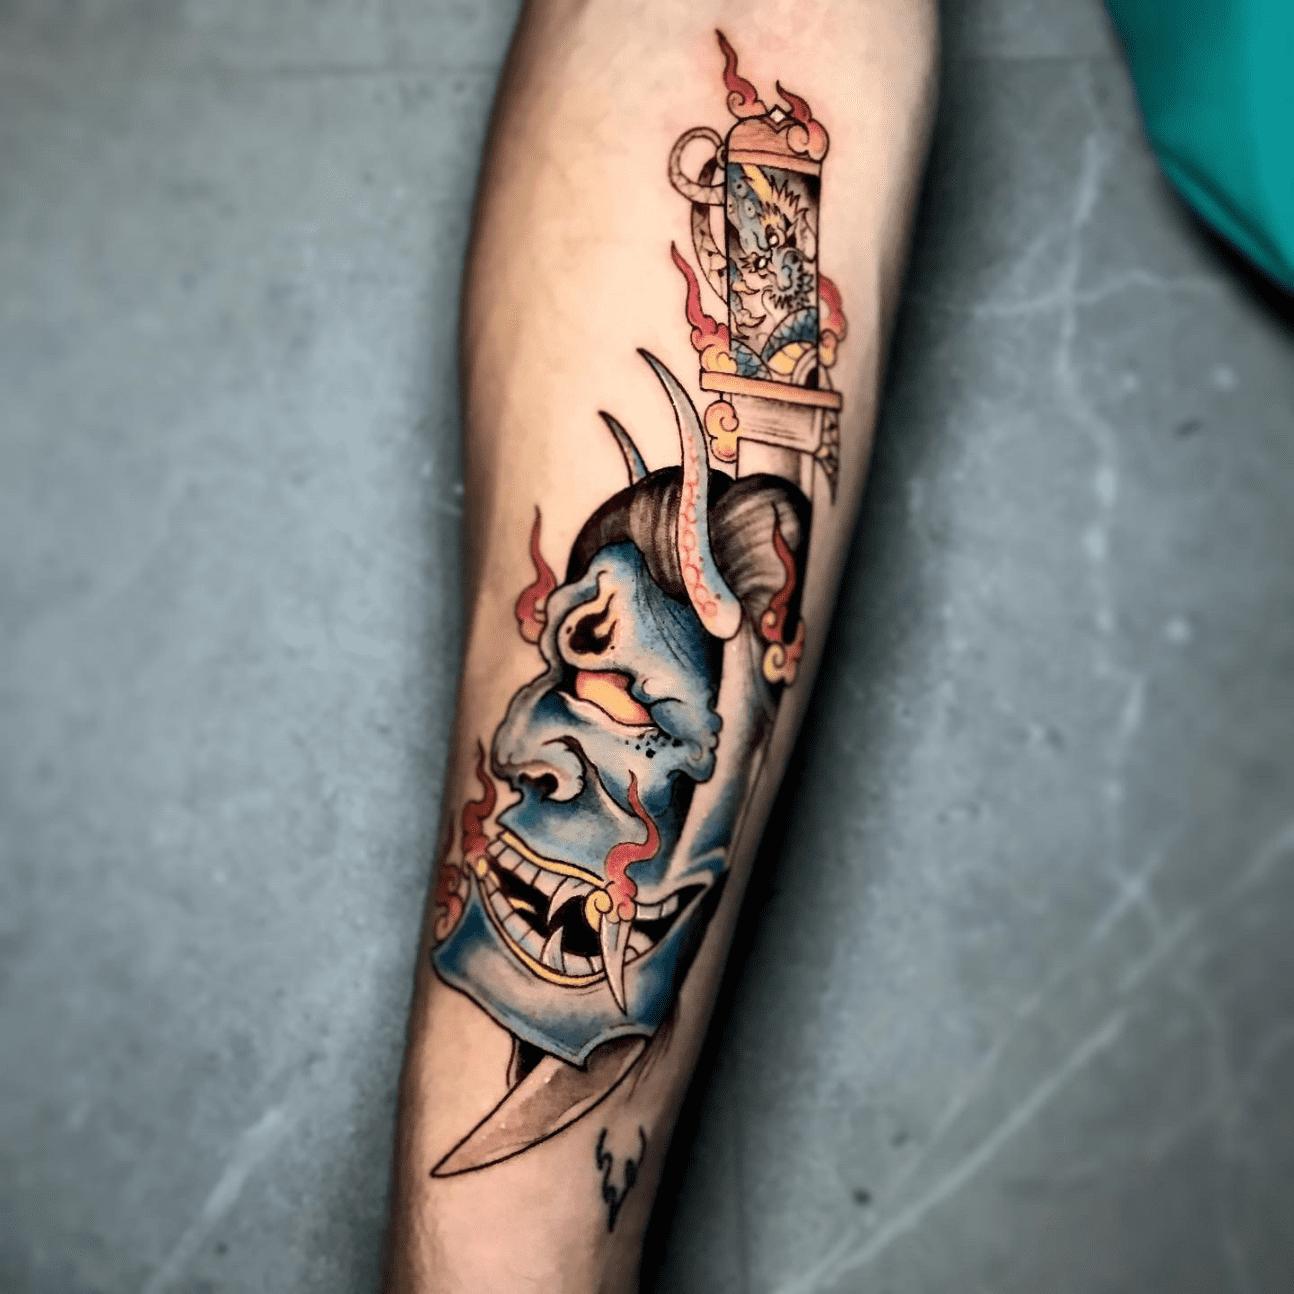 Tattoo giapponesi: la maschera di Hannya